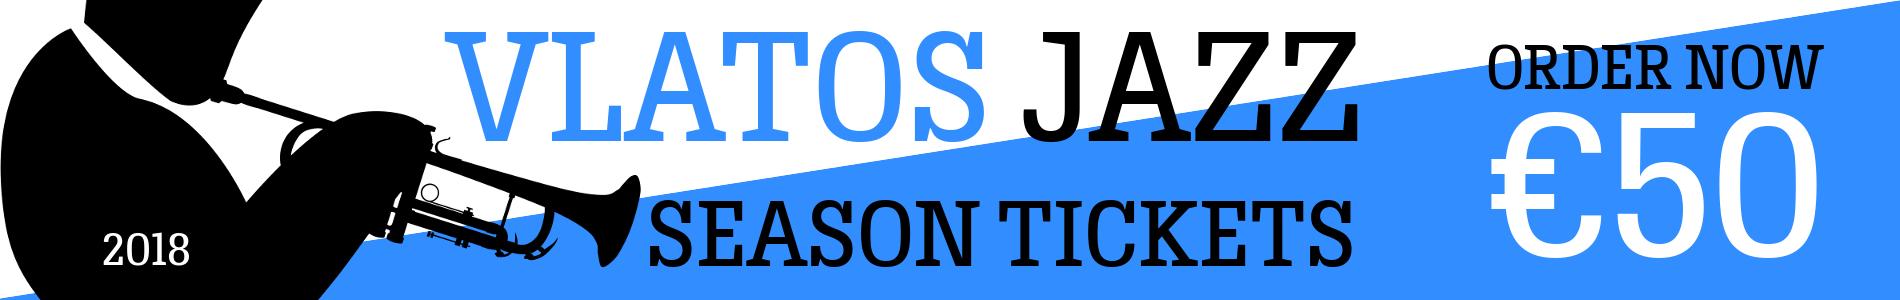 Vlatos Jazz 2018 Season Ticket